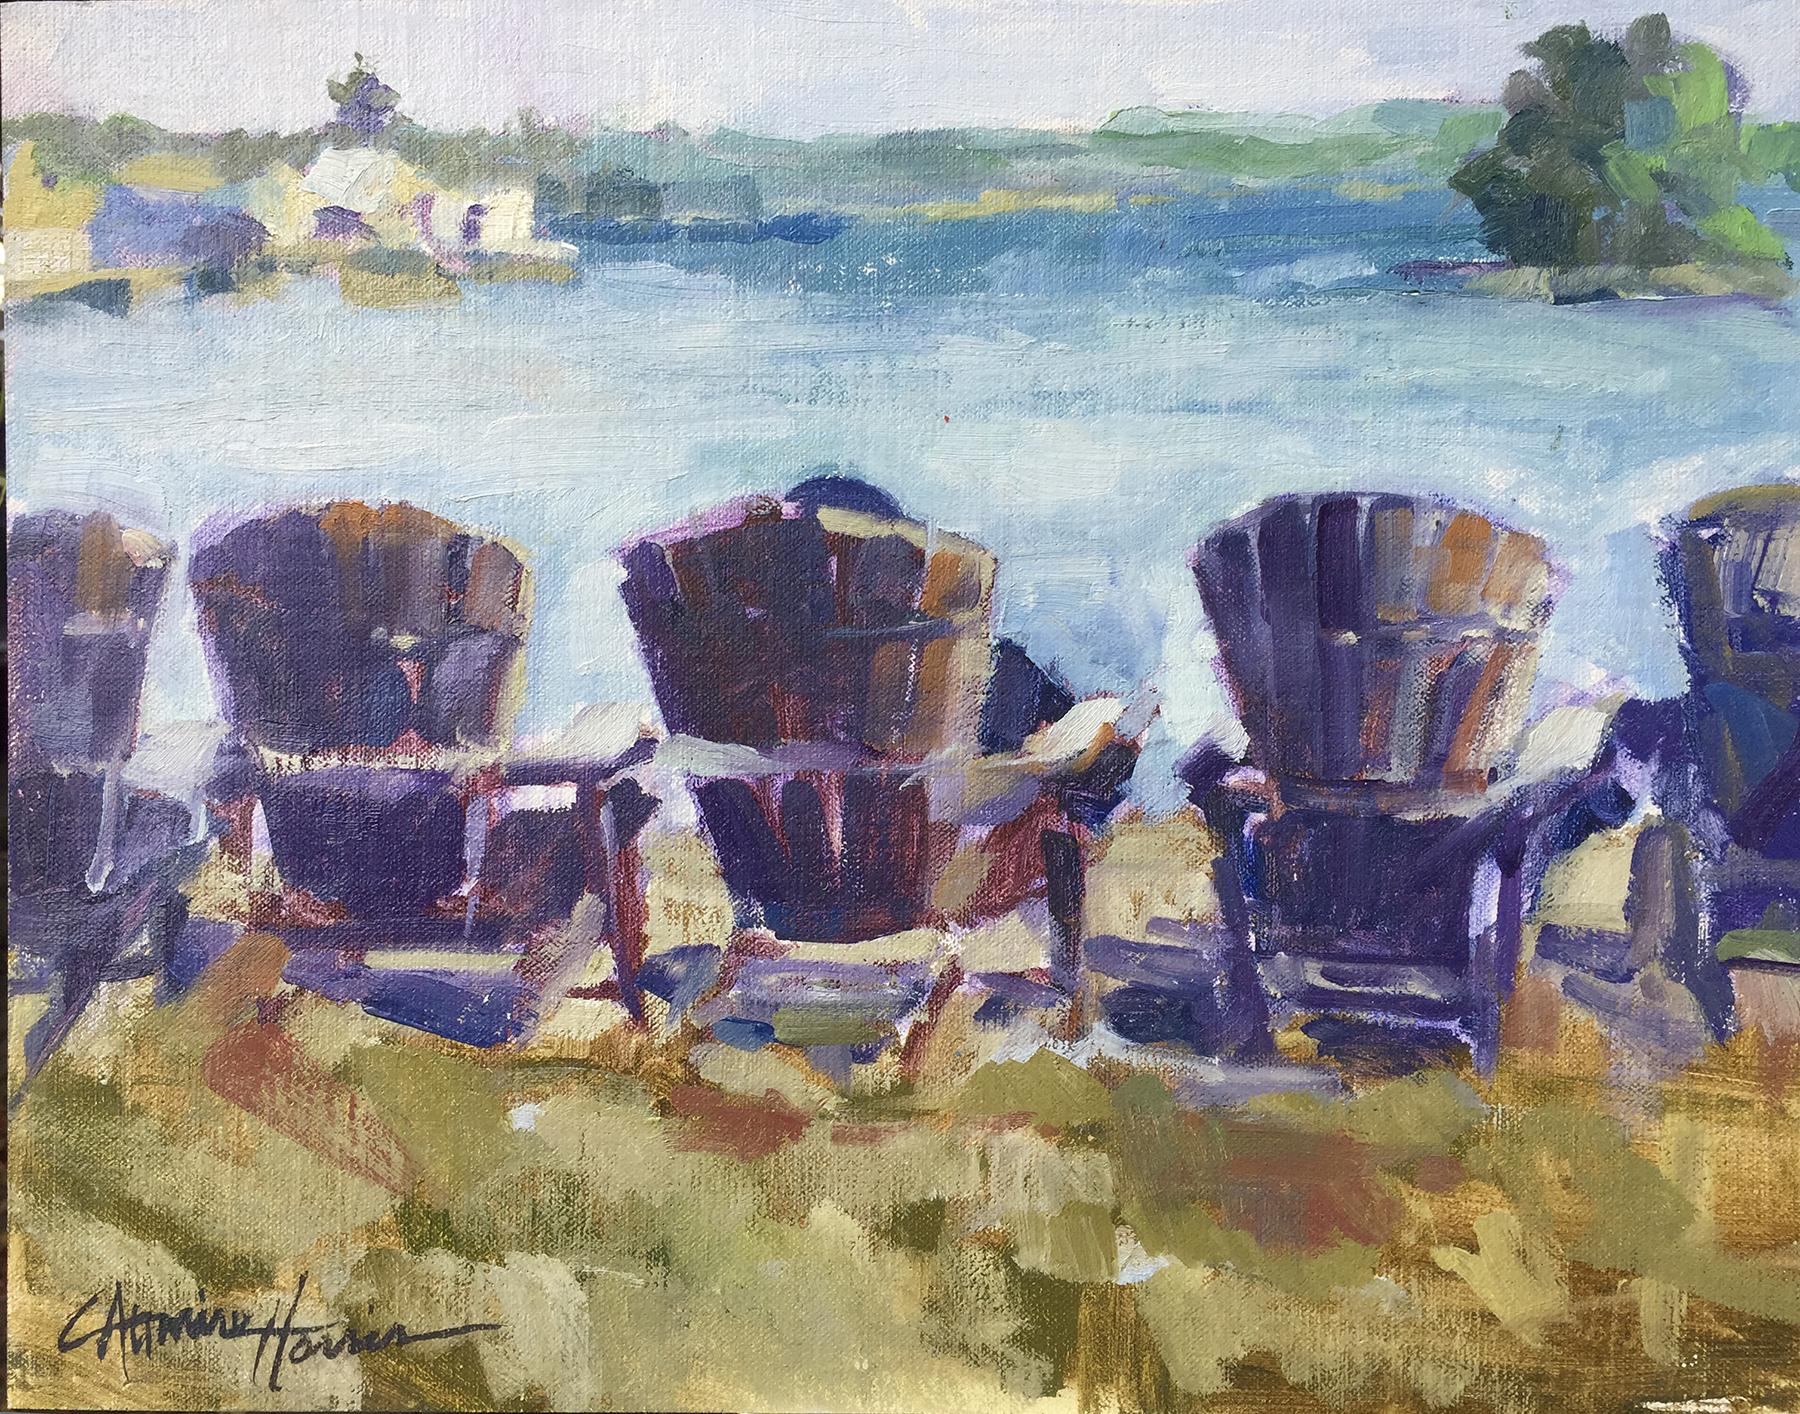 Adirondack Chairs at The Inn*